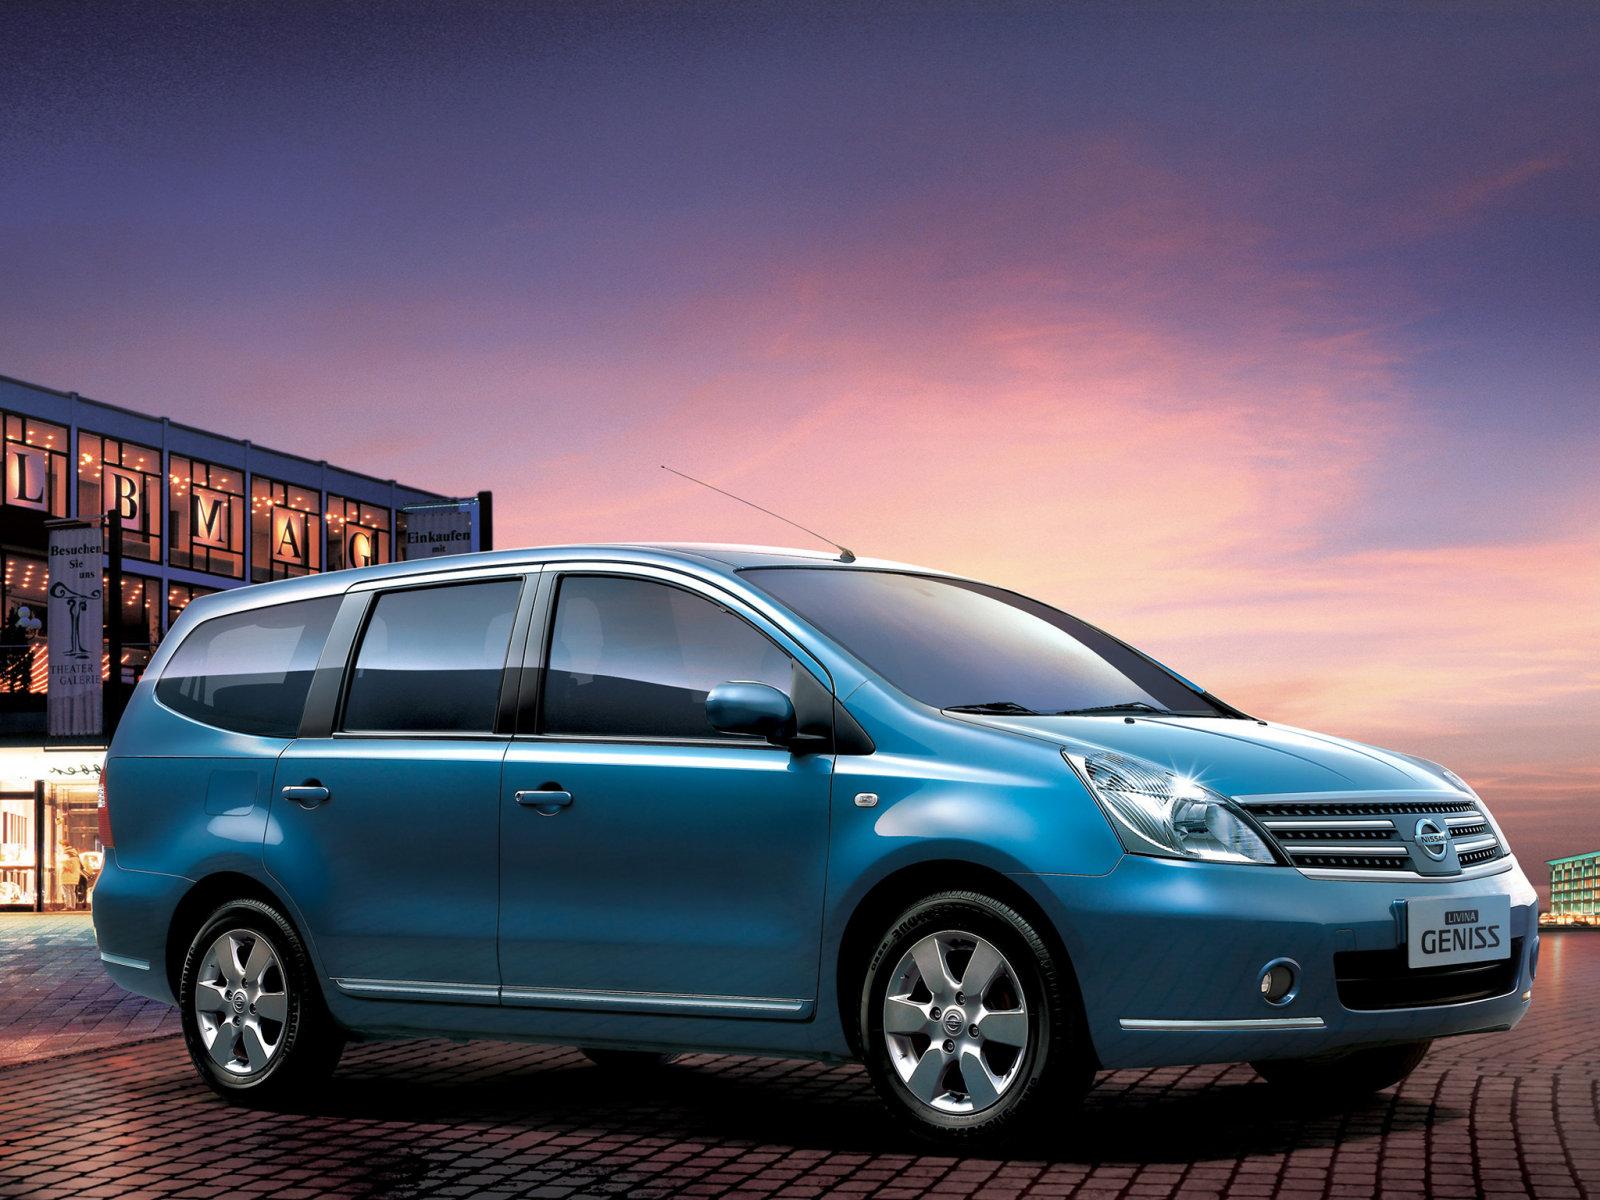 Toyota Grand New Veloz 1.5 Avanza Gambar Best Nissan Livina Hd Wallpapers Part 5 Cars